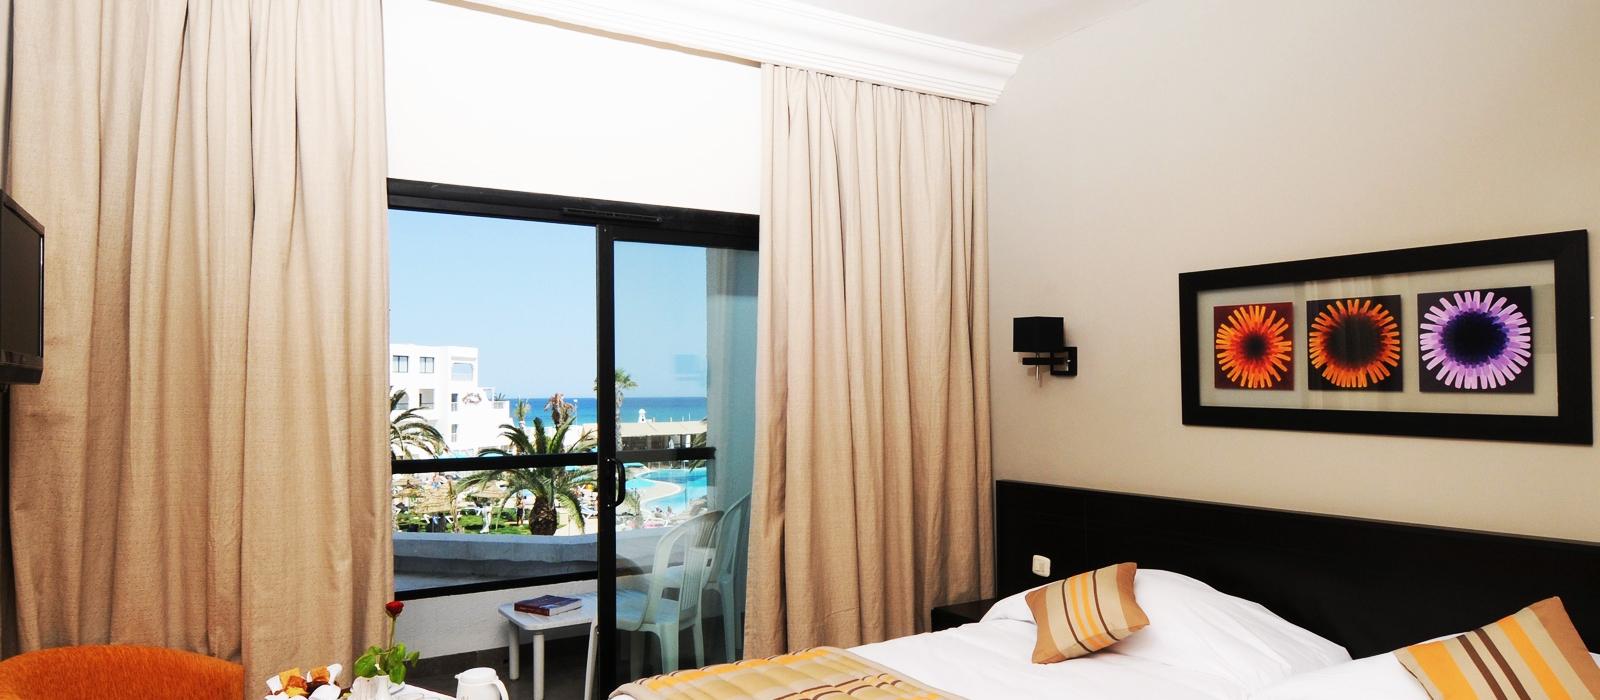 Doppelzimmer mit Meerblick  Hotel Hamammet Nozha Beach - Vincci Hoteles